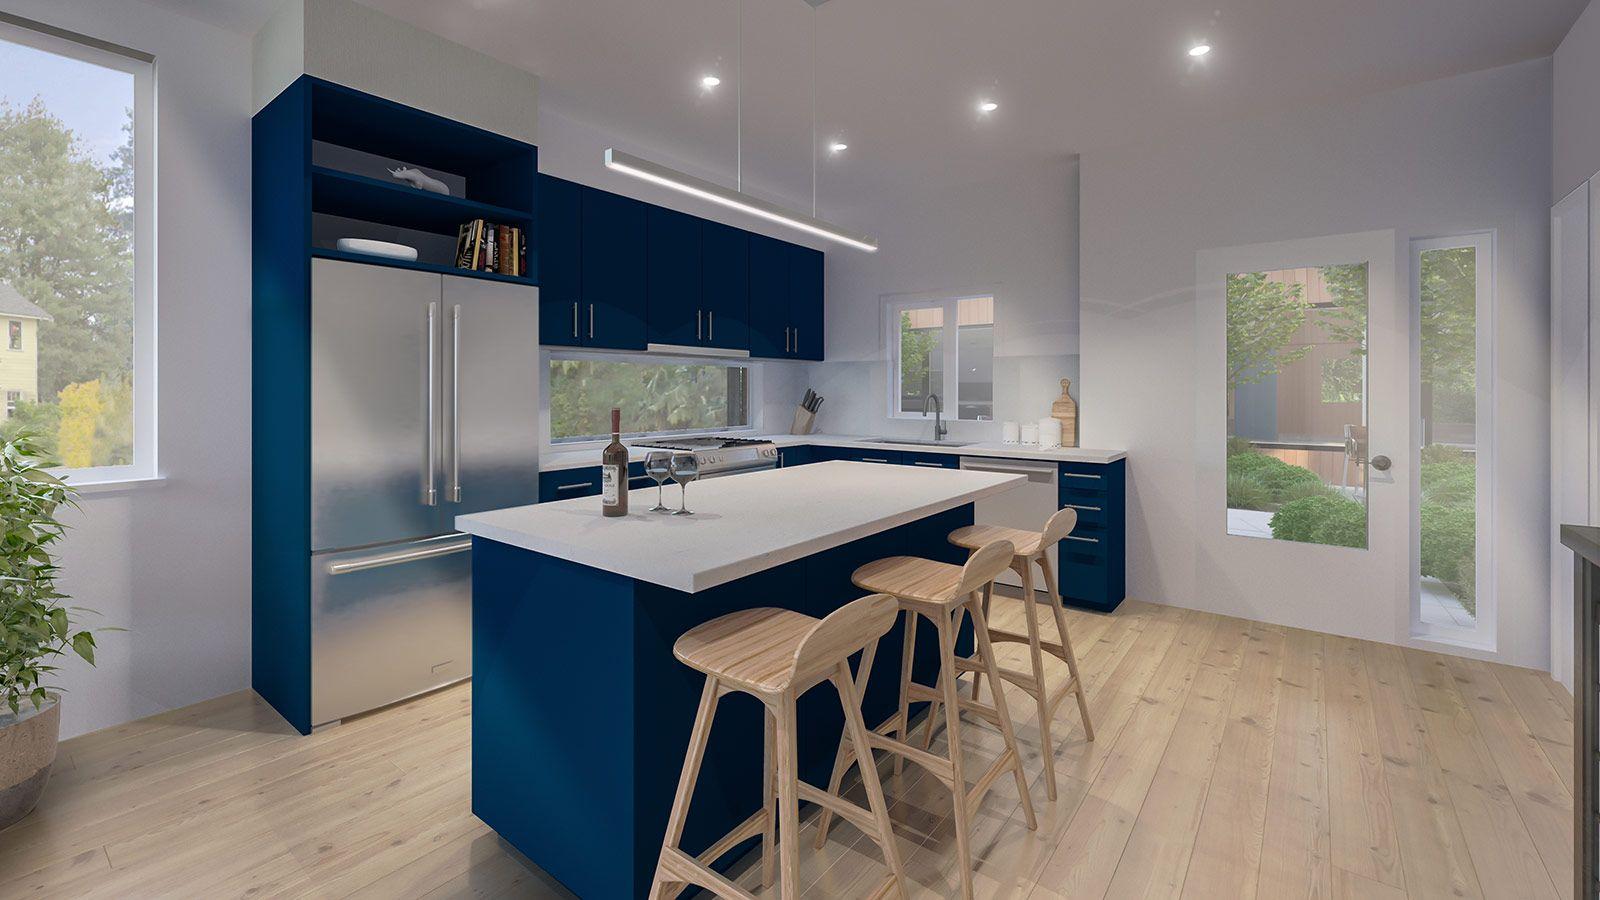 Kitchen featured in the Plan B2 By StoryBuilt in Seattle-Bellevue, WA